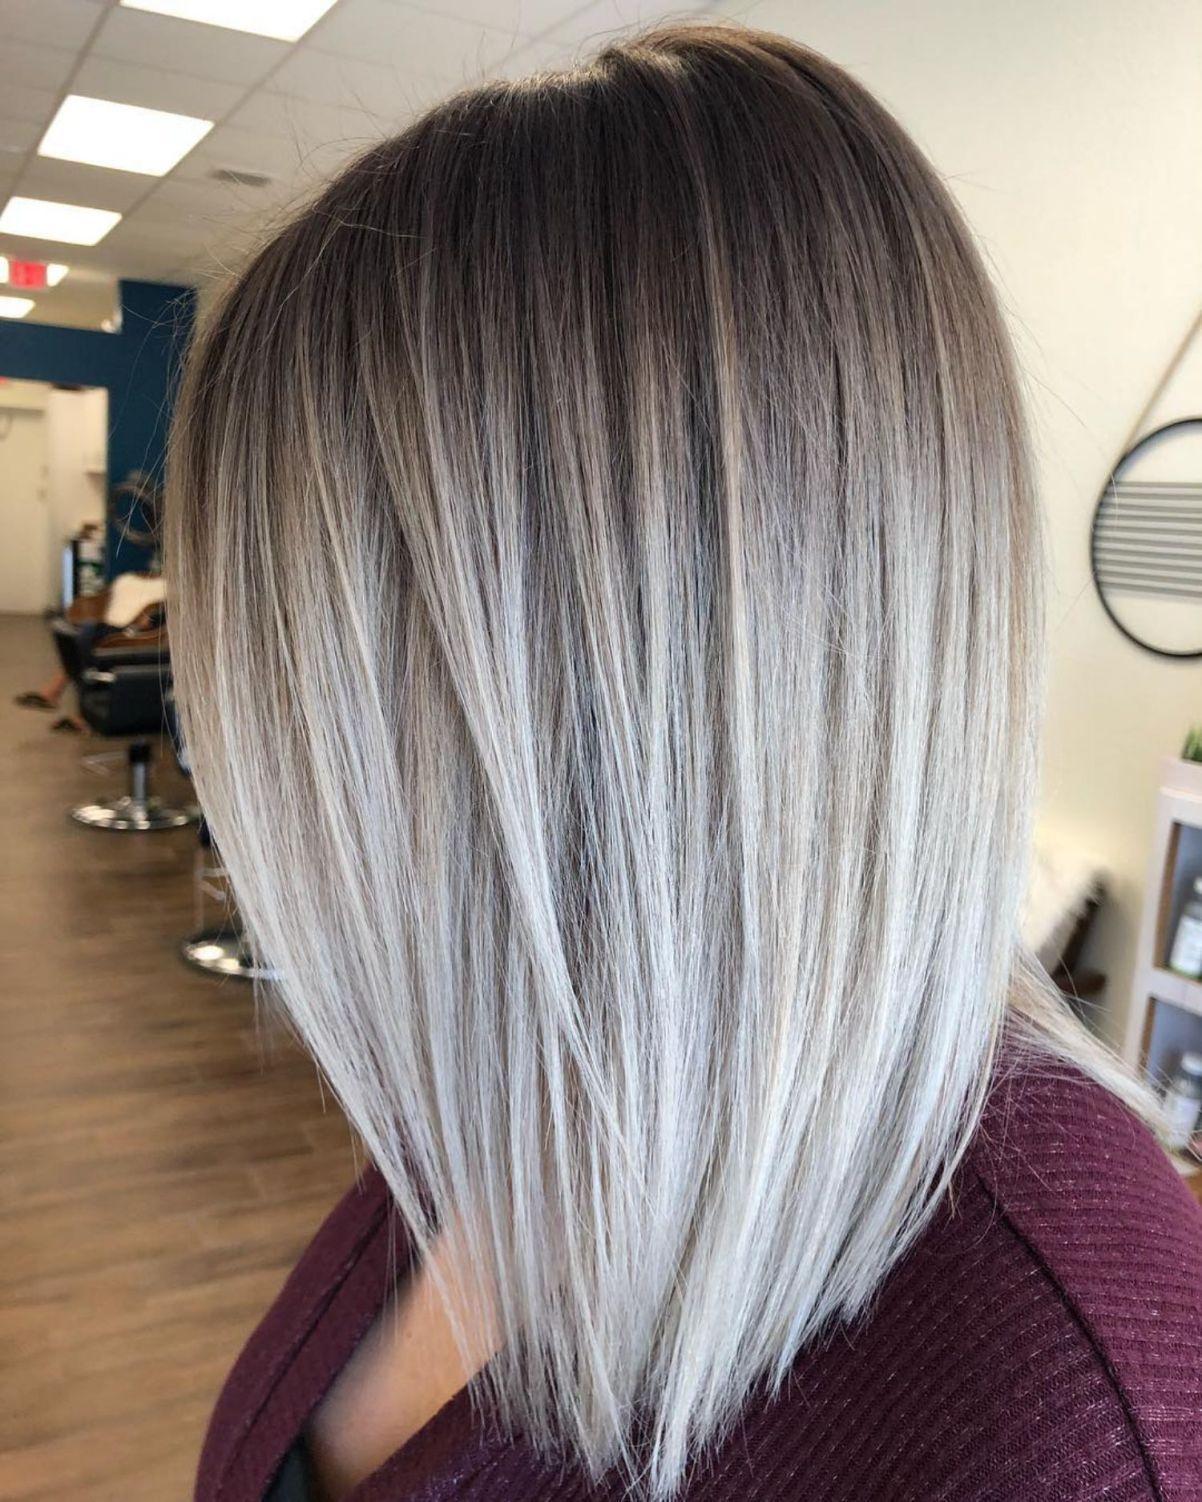 Gray Bronde Balayage Fade In 2020 Medium Length Hair Styles Long Hair Styles Hair Styles